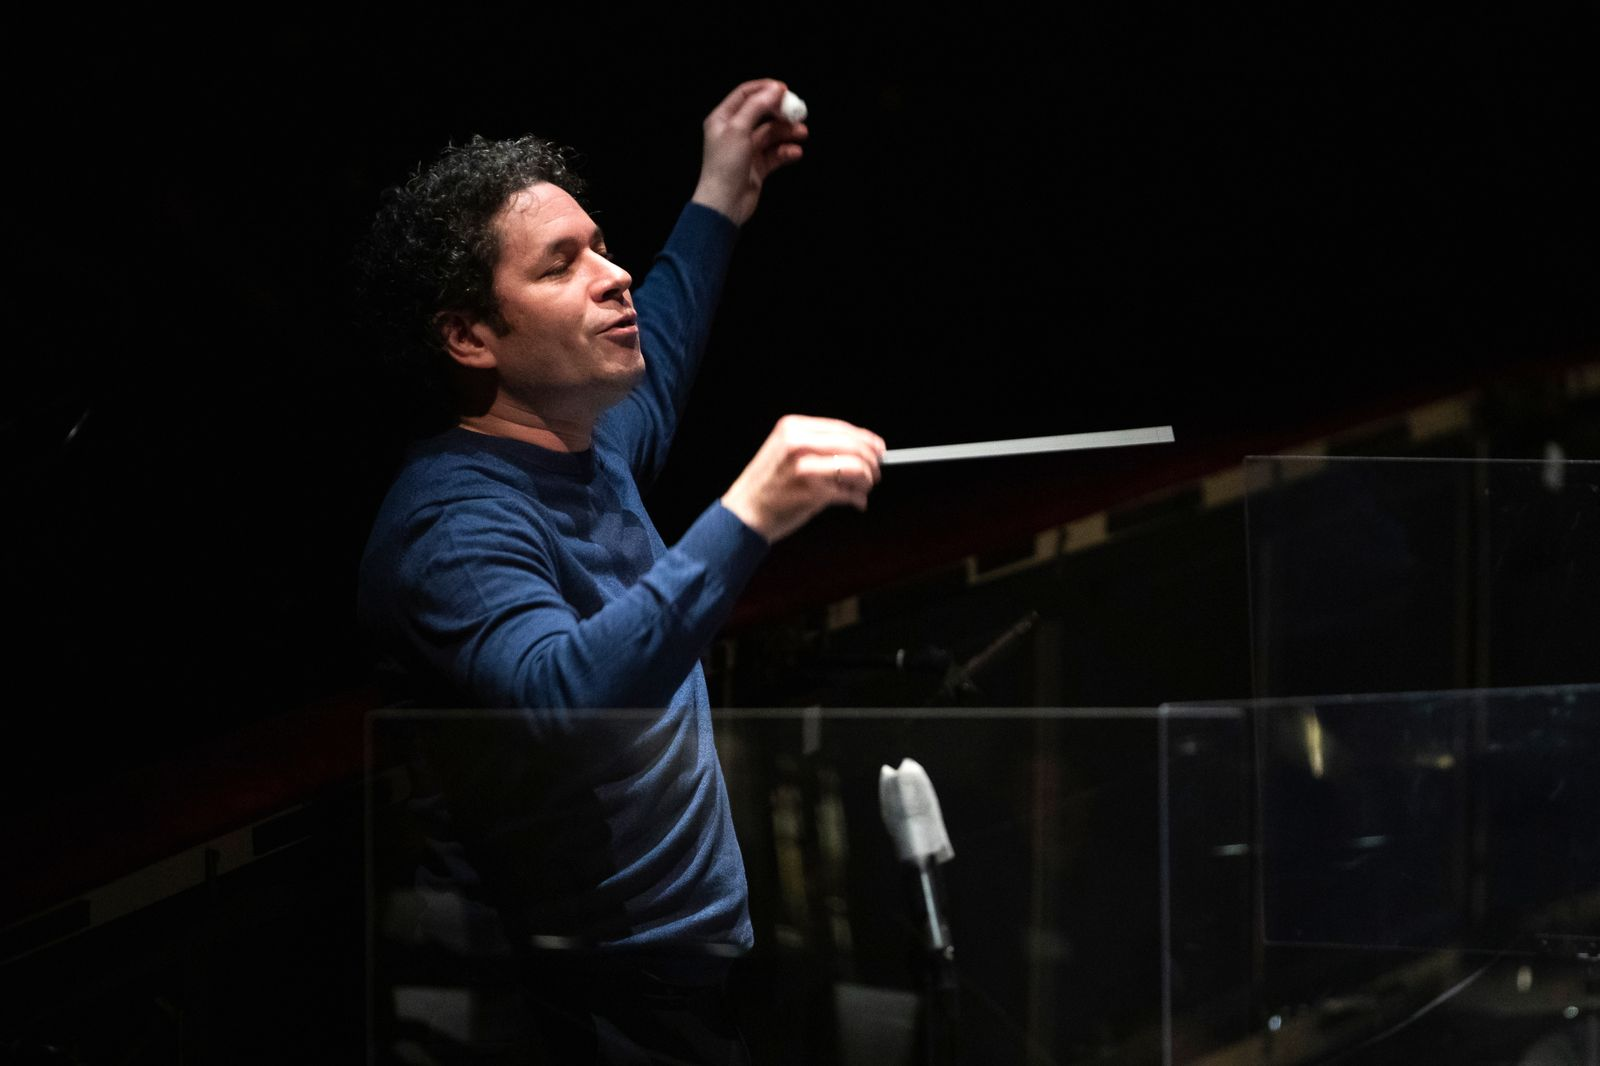 'Otello' Rehearsal At Liceu In Barcelona